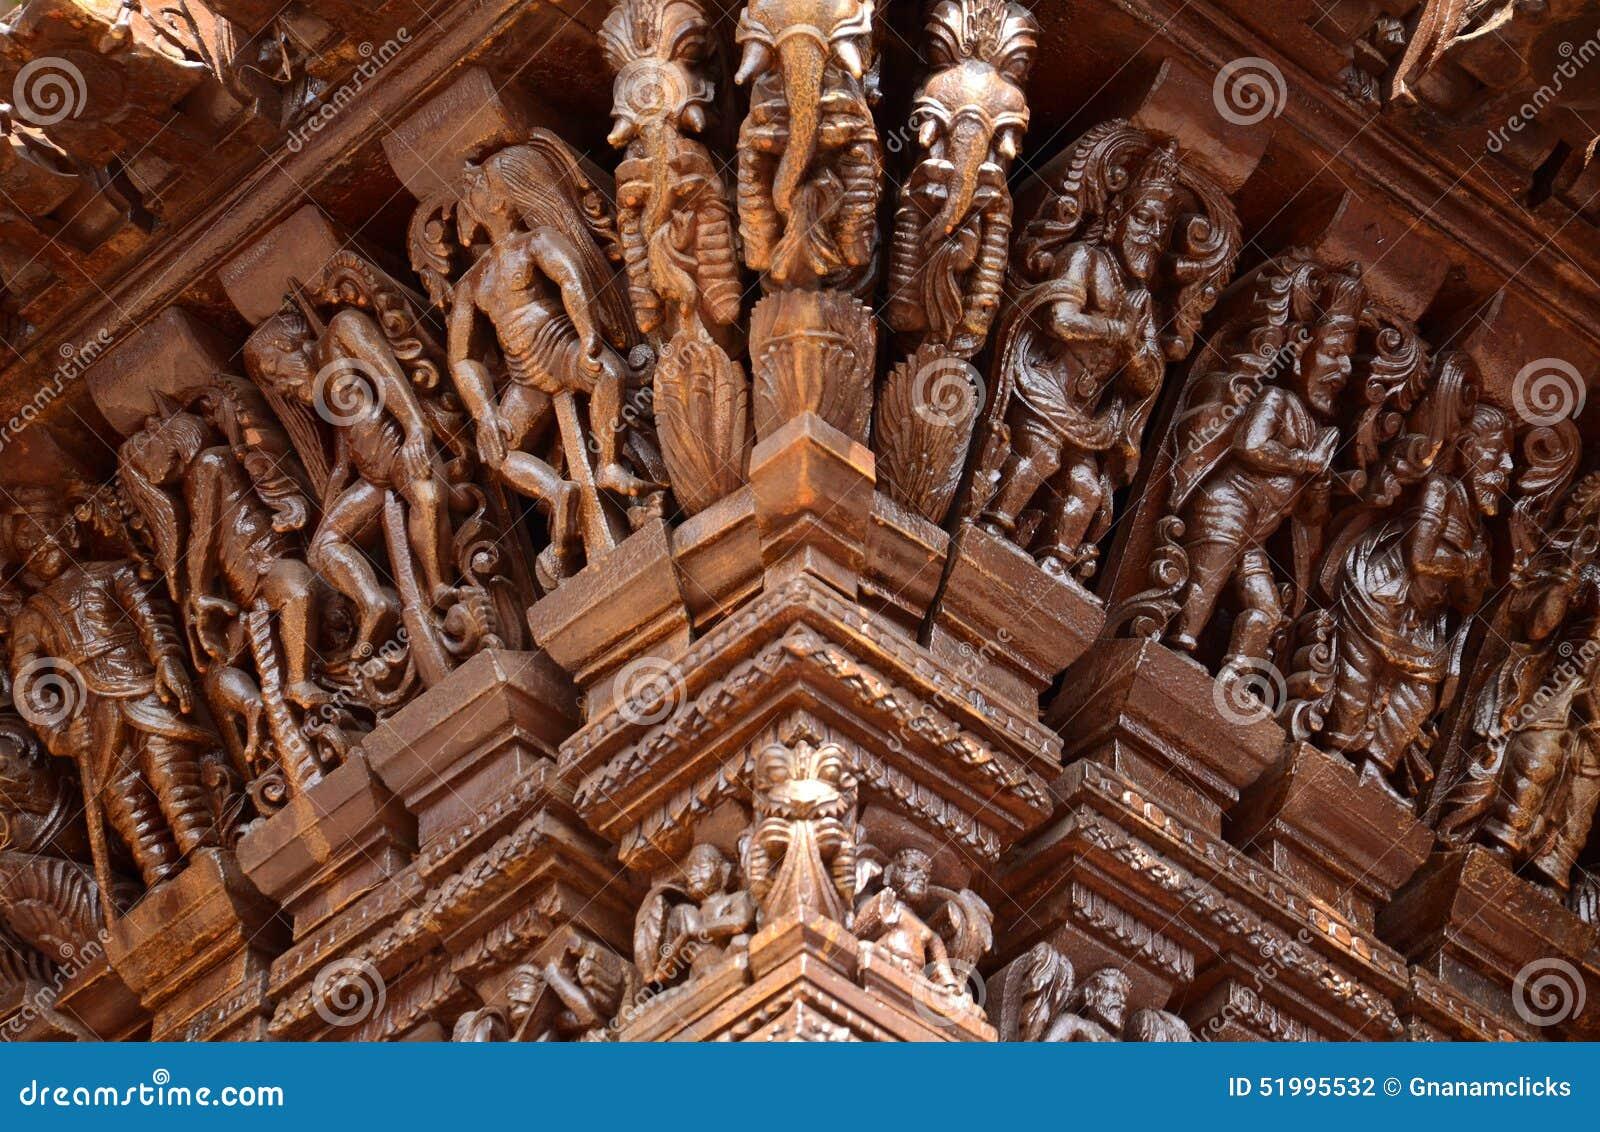 Hindu gods on chariot stock photo image of religion